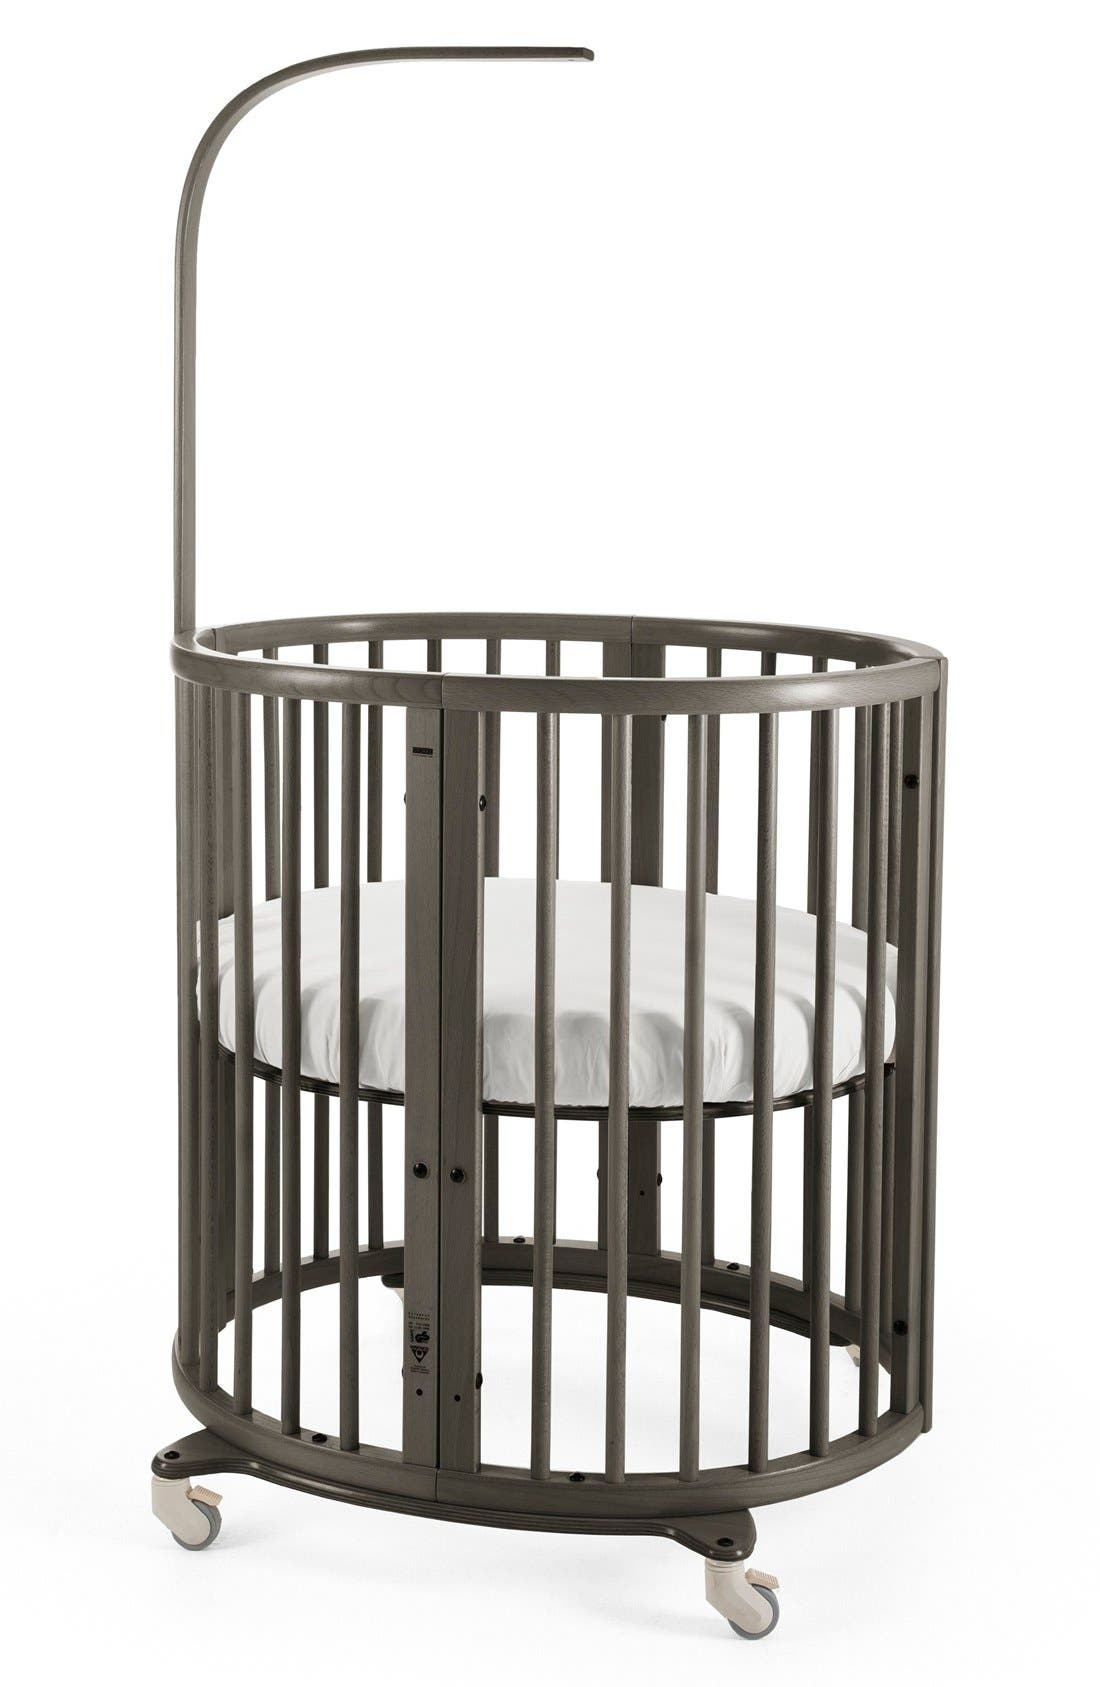 Main Image - Stokke Sleepi Mini Crib, Drape Rod & Mattress Bundle